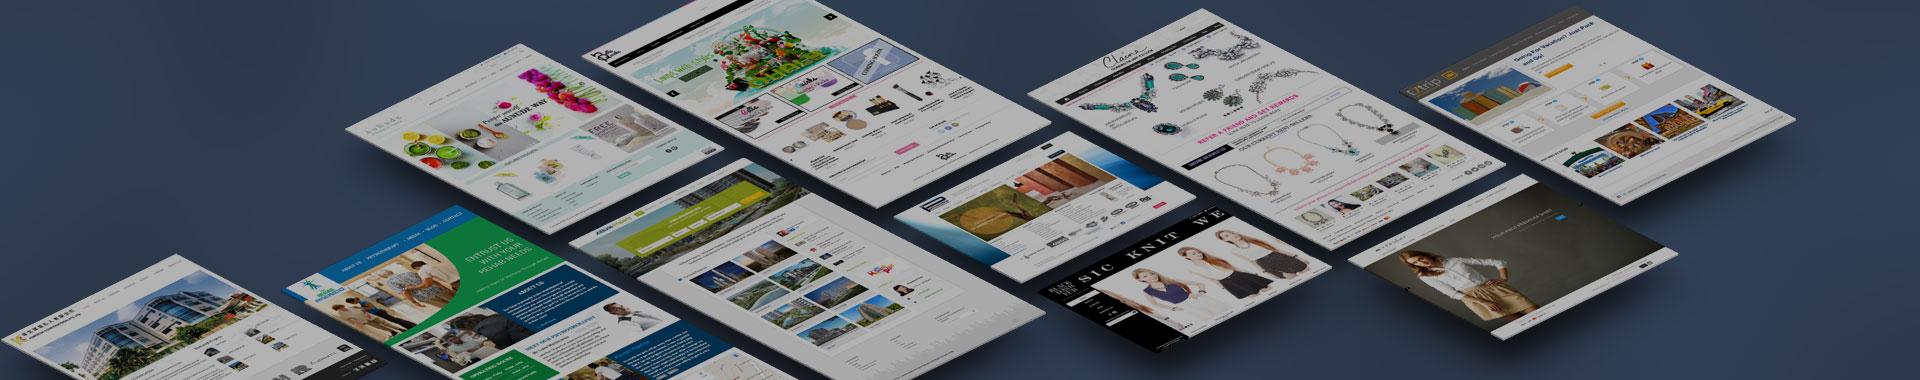 Website Design Singapore - Girls in Paradise